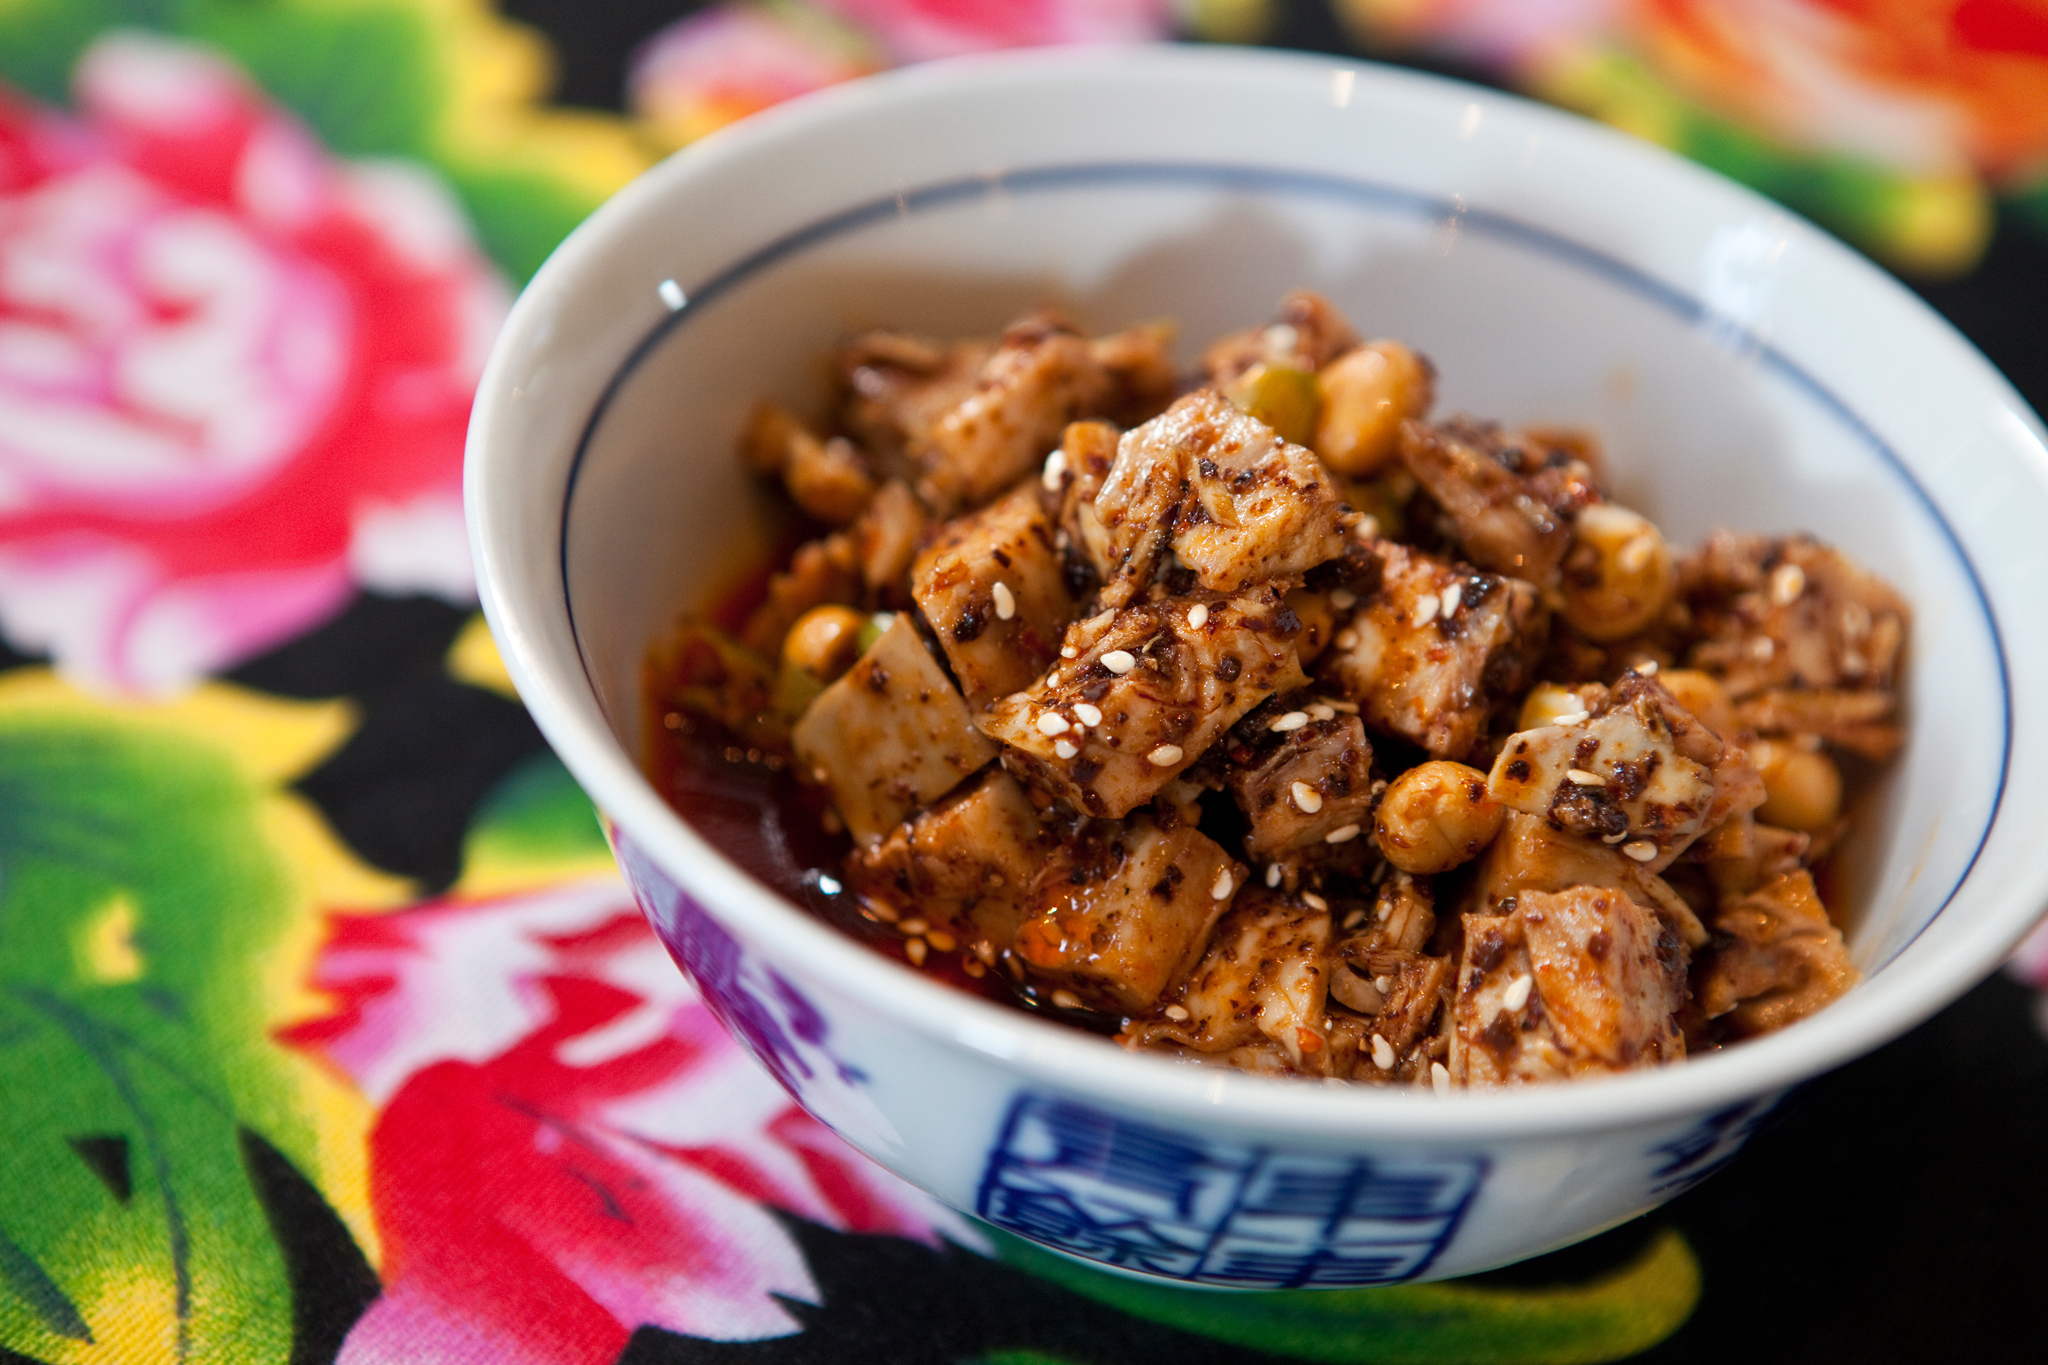 The best international food in new york city 2012 - Best international cuisine ...